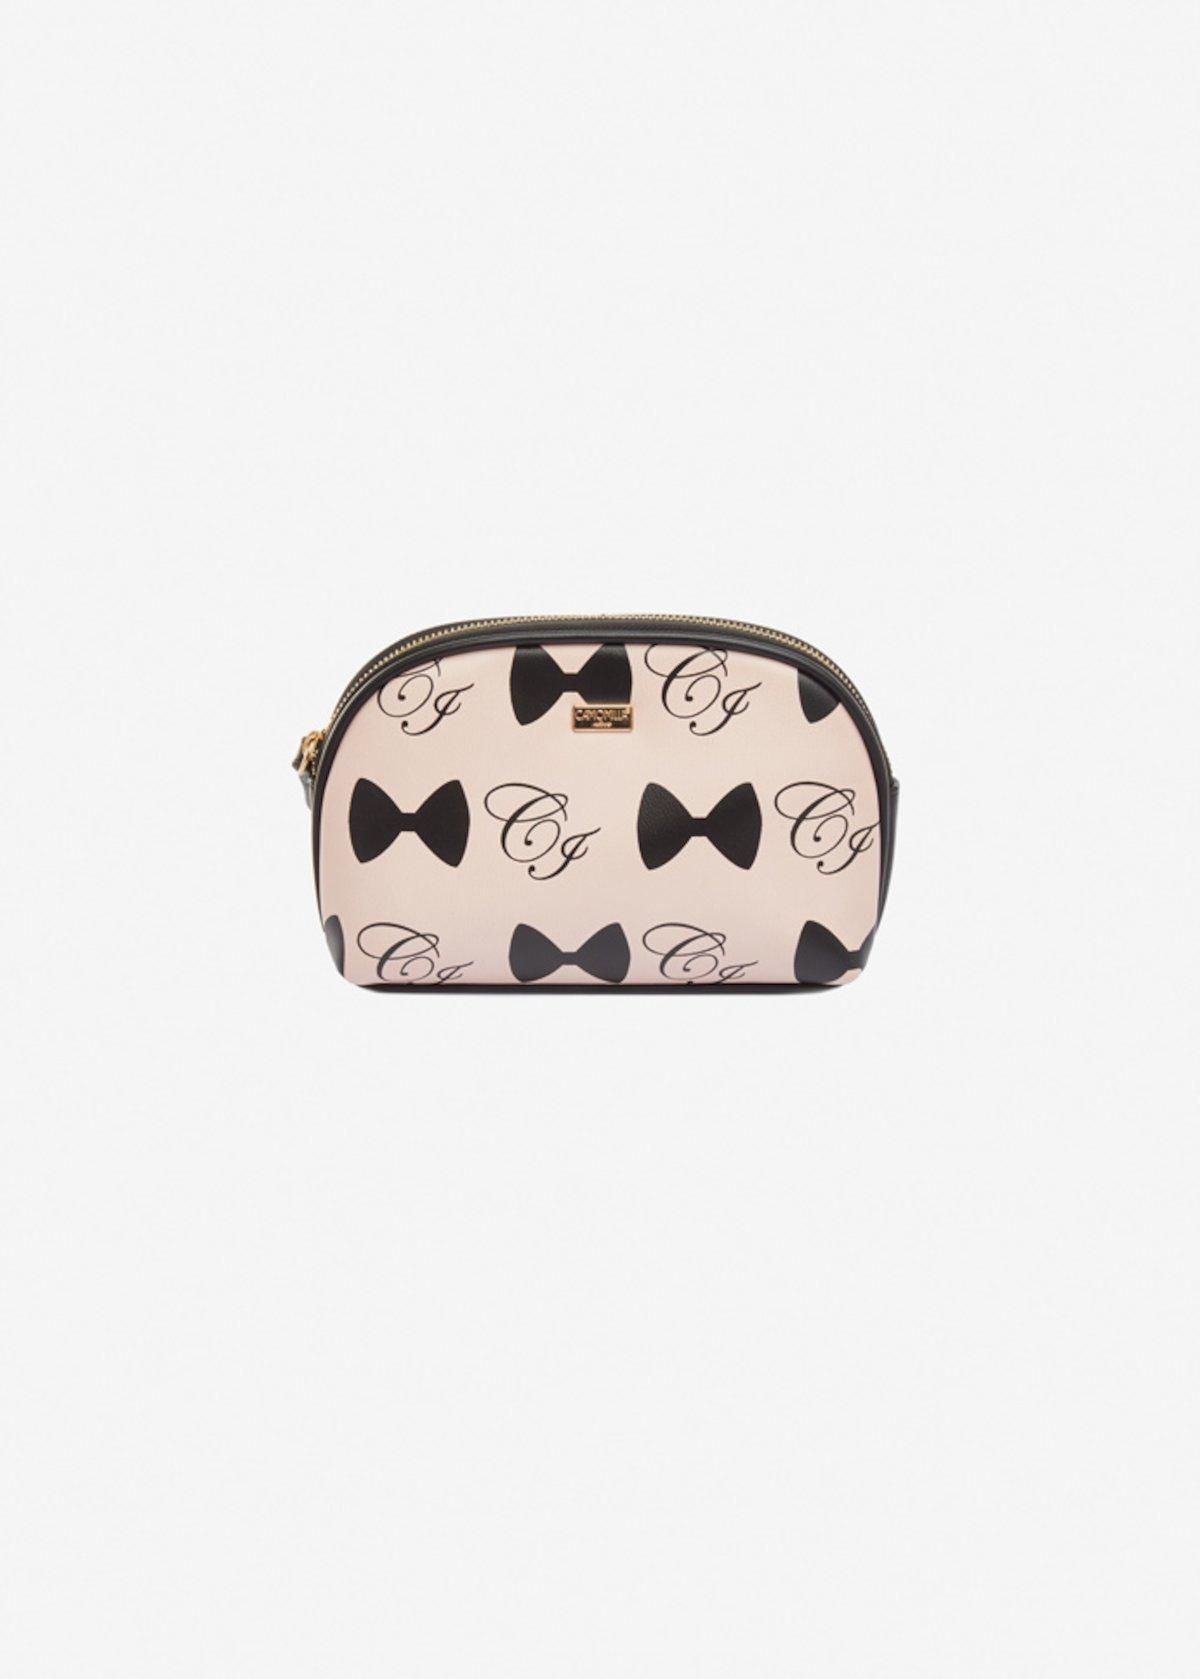 Berta faux-leather beauty case with bows print - Magnolia Black Fantasia